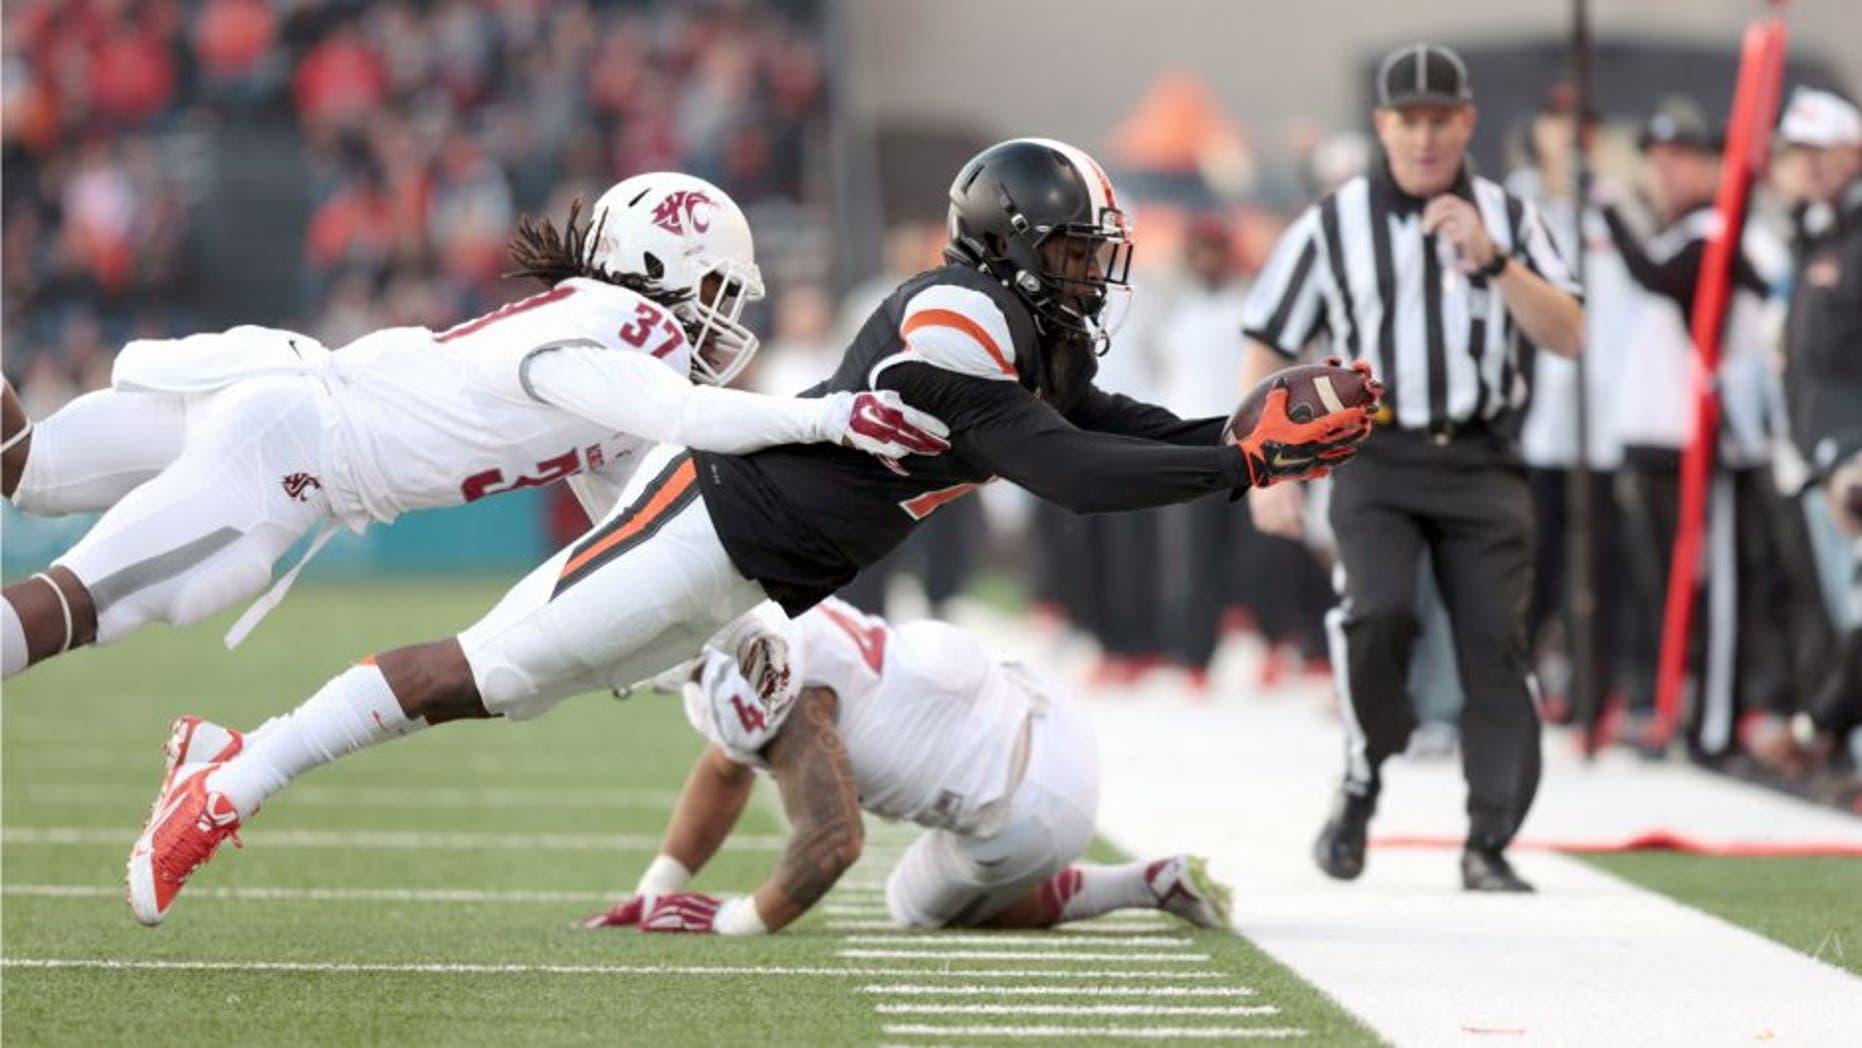 Nov 8, 2014; Corvallis, OR, USA; Washington State Cougars safety Sulaiman Hameed (37) tackles Oregon State Beavers wide receiver Hunter Jarmon (7) at Reser Stadium. Mandatory Credit: Scott Olmos-USA TODAY Sports